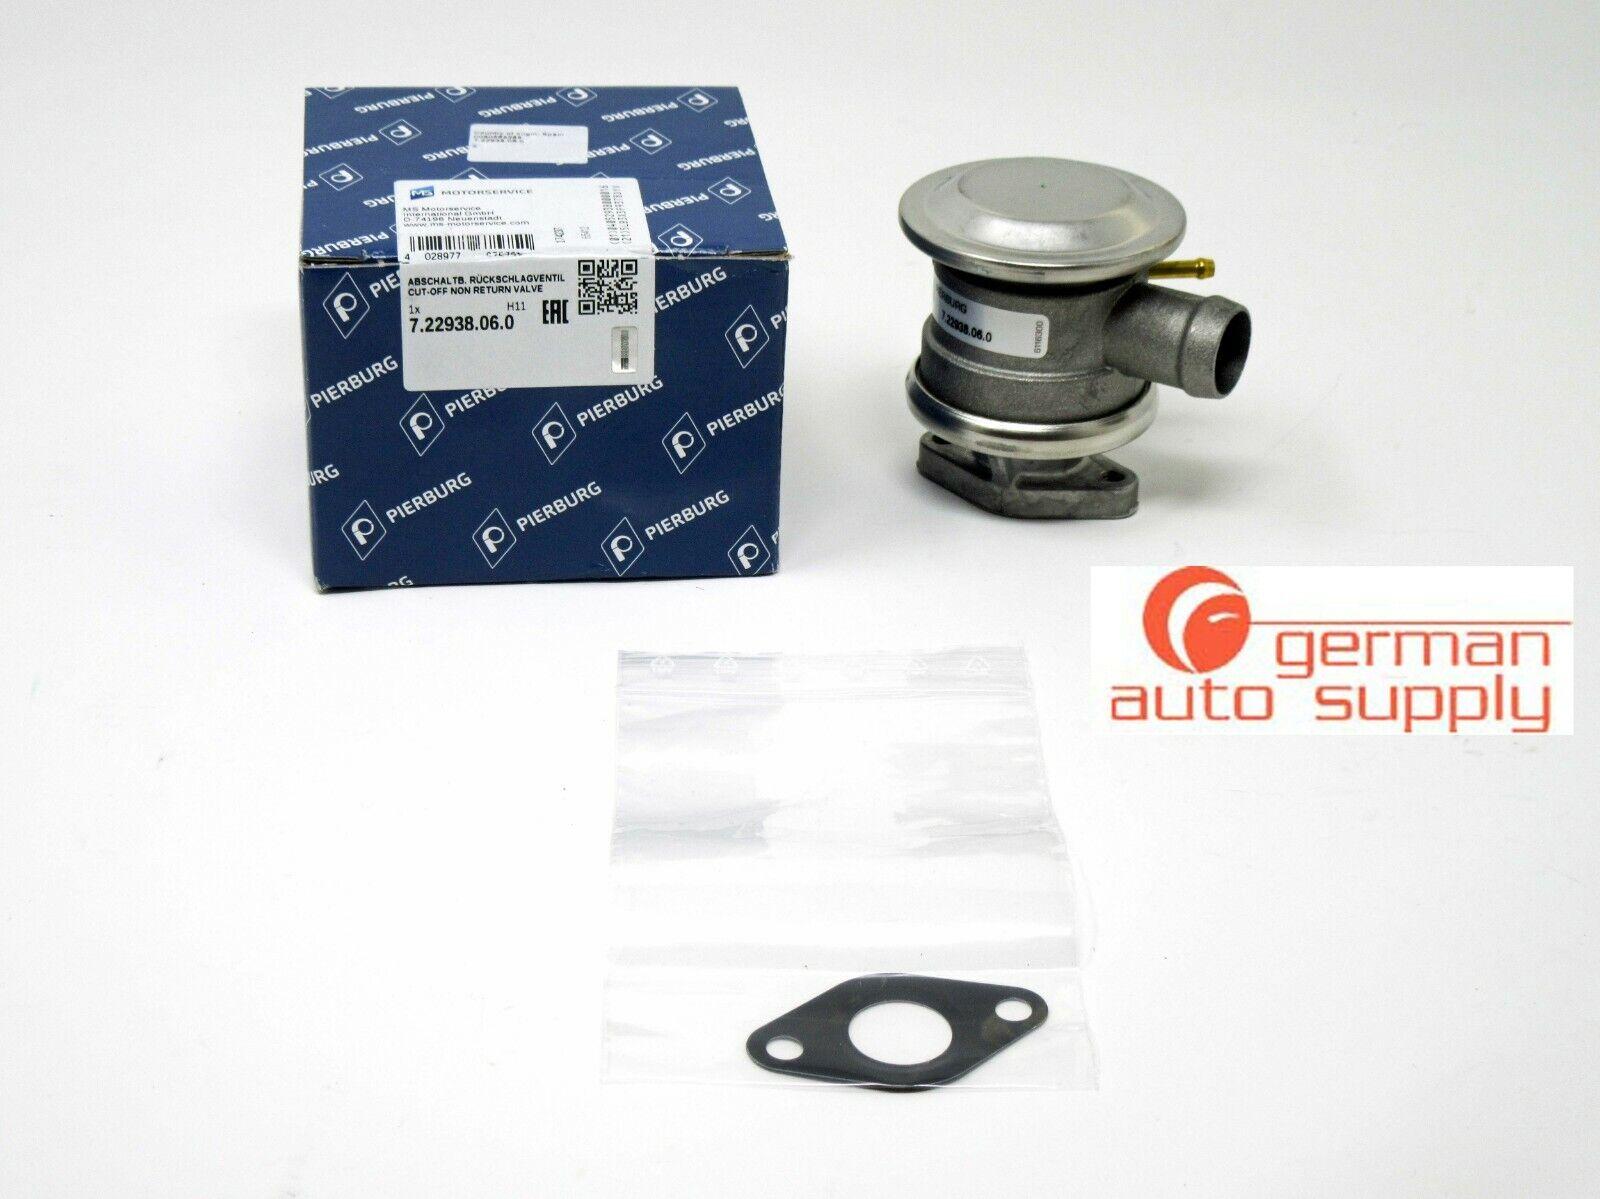 One New Pierburg Secondary Air Injection Shut-Off Valve 722938060 for Porsche